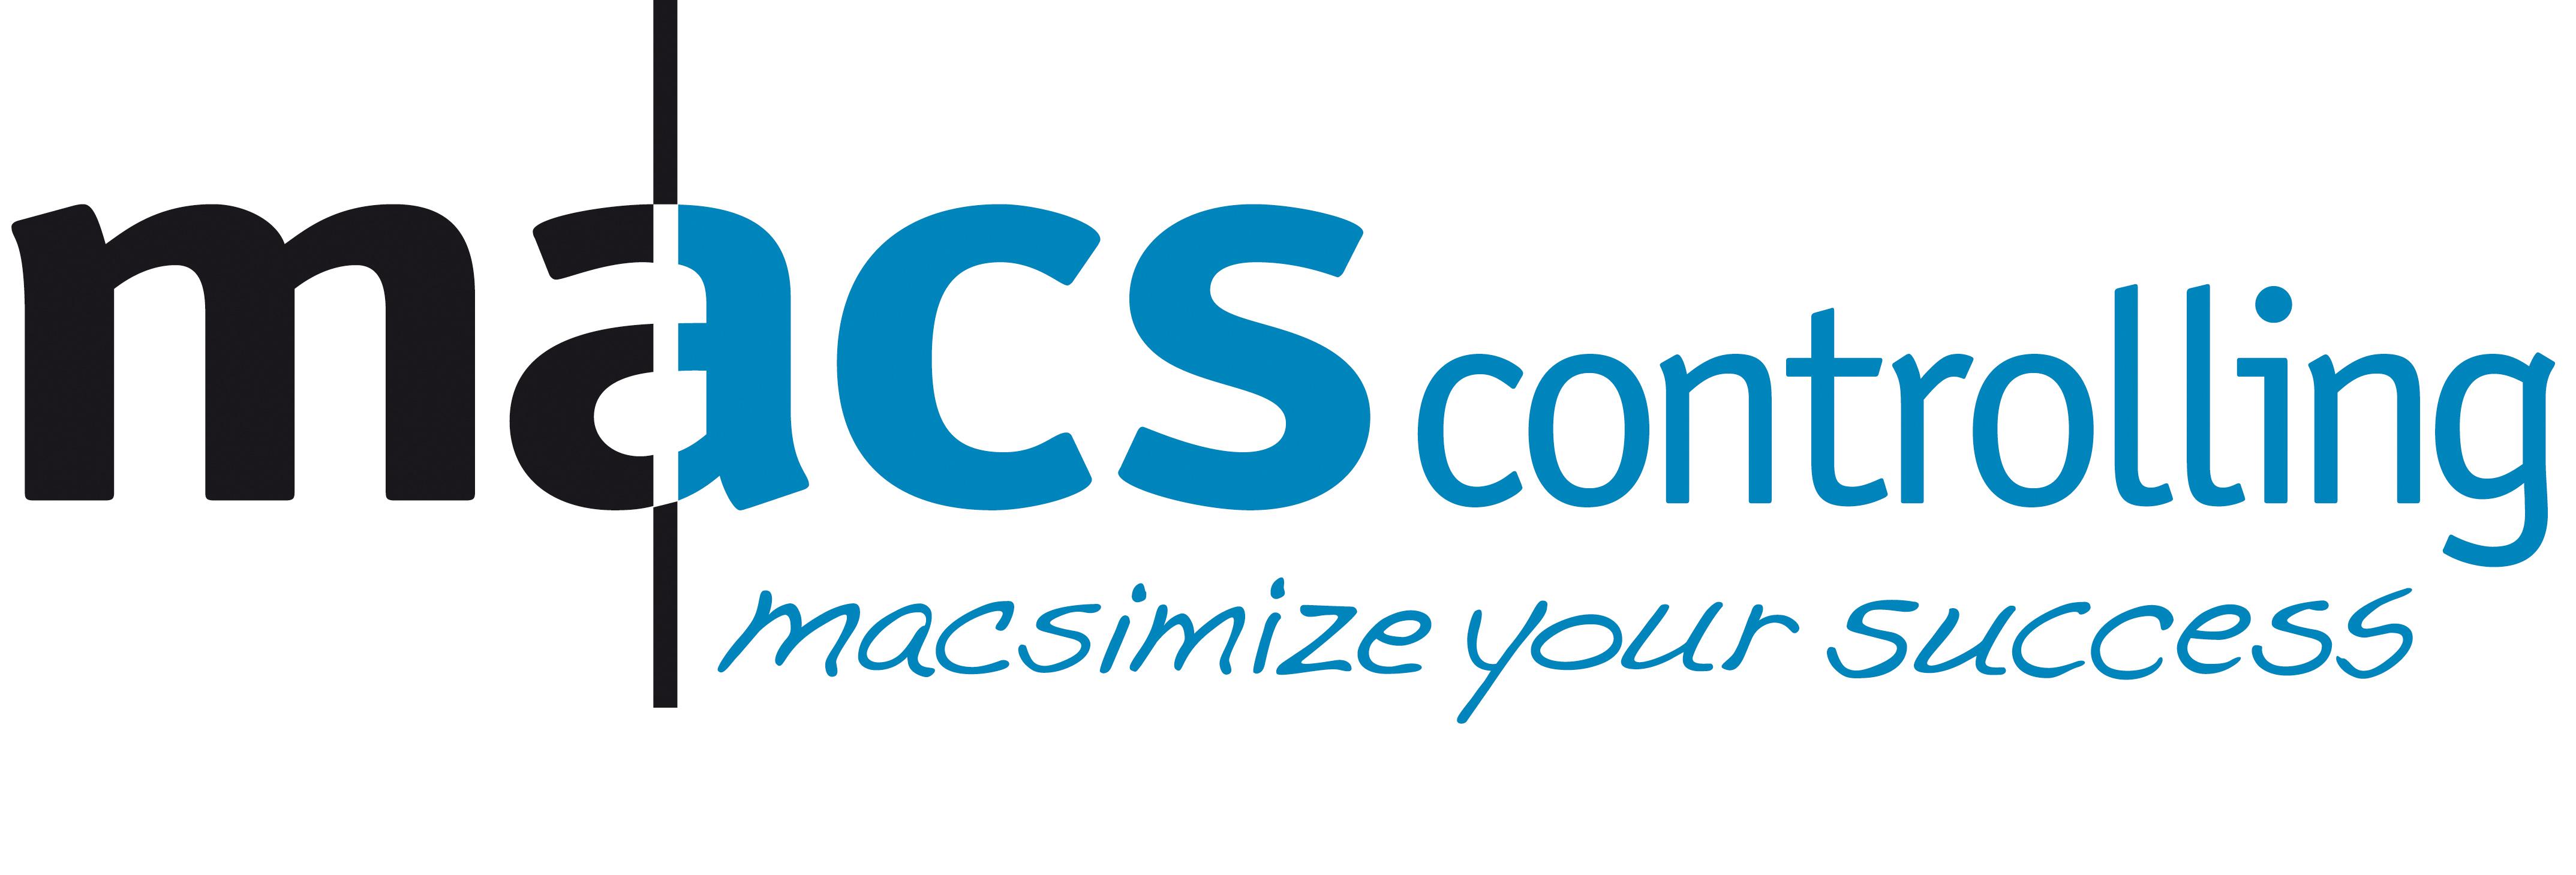 Macs controlling